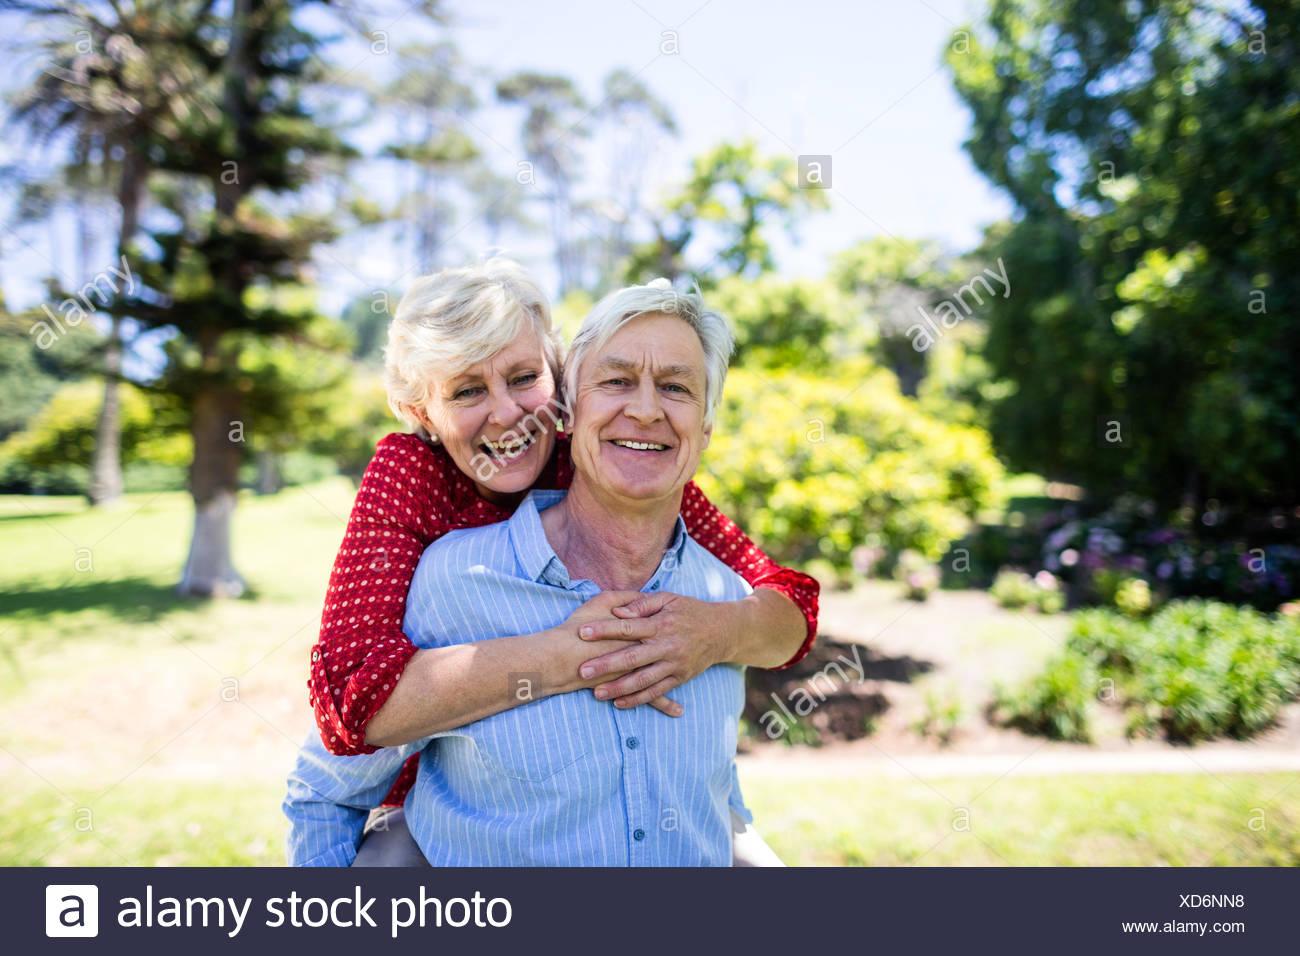 Happy senior man giving a piggy back to senior woman - Stock Image